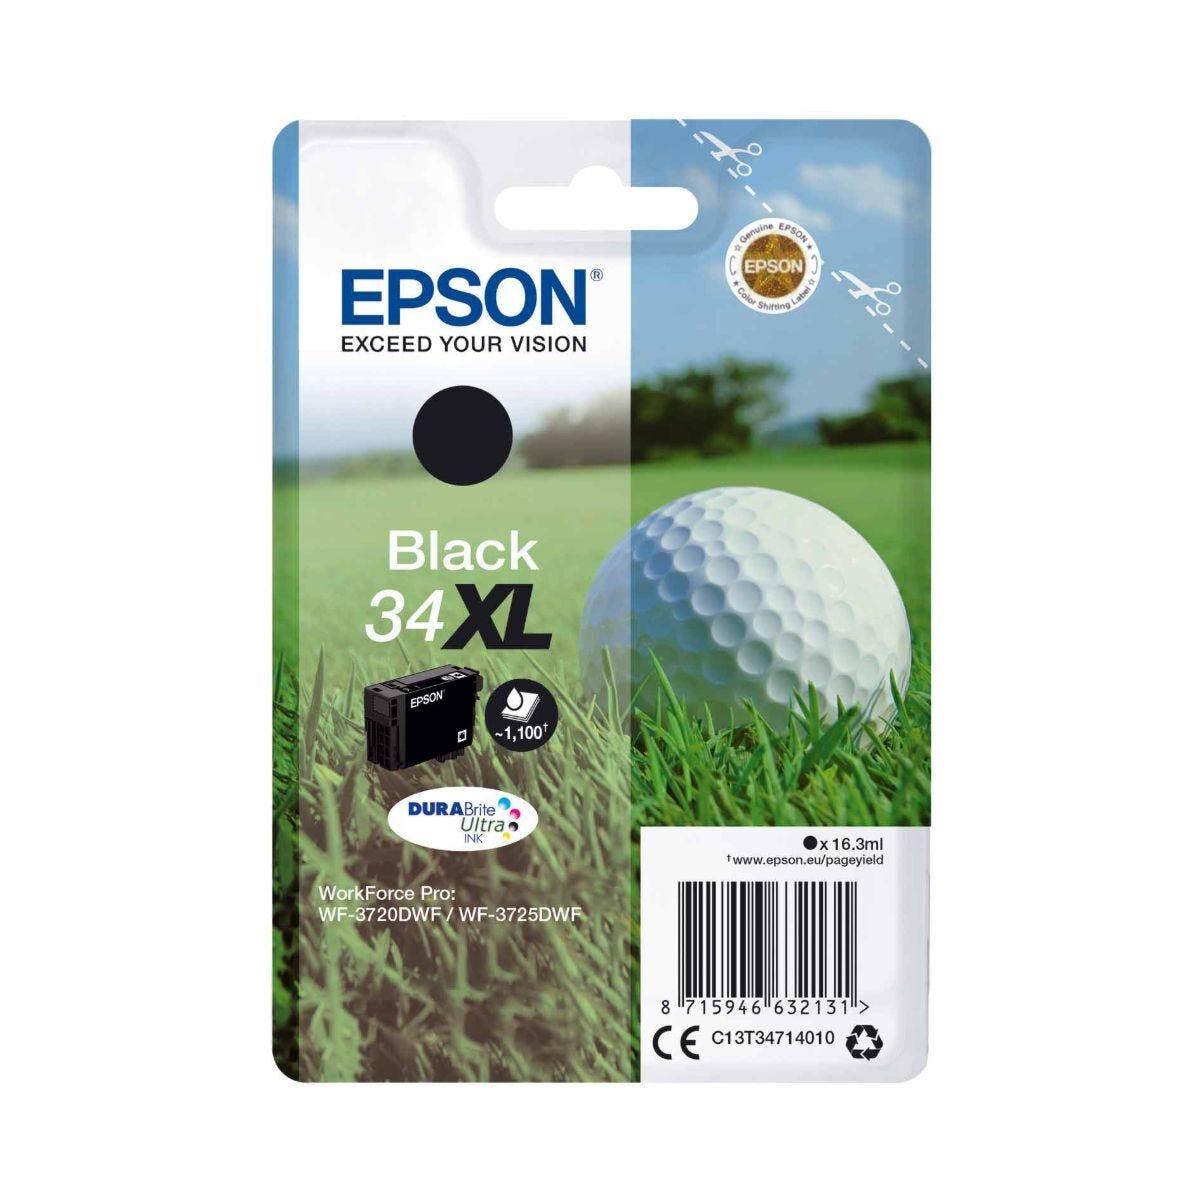 Epson 34XL Black Ink Cartridge